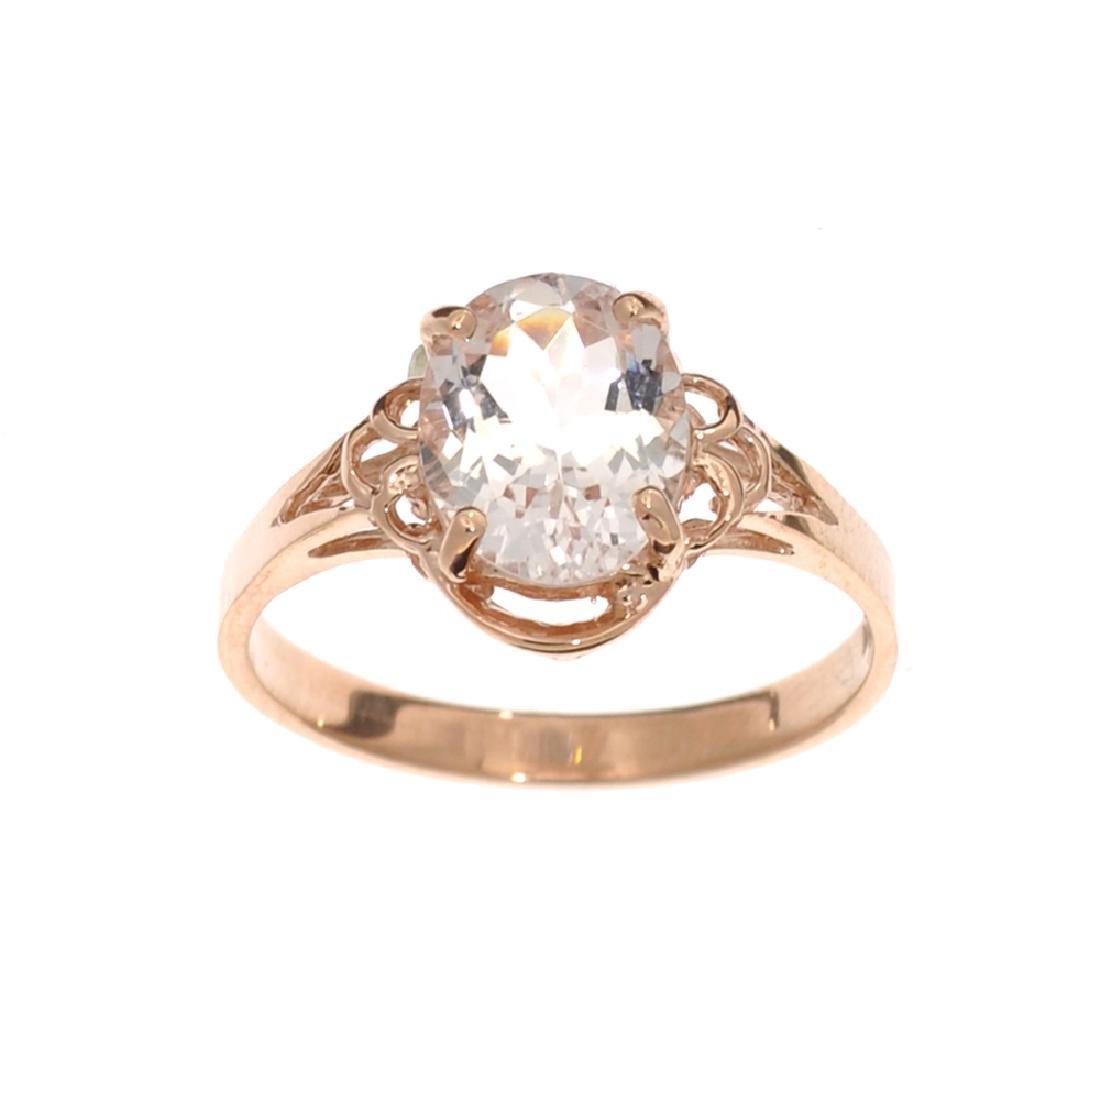 APP: 1.4k Fine Jewelry 14 KT Gold, 1.65CT Oval Cut